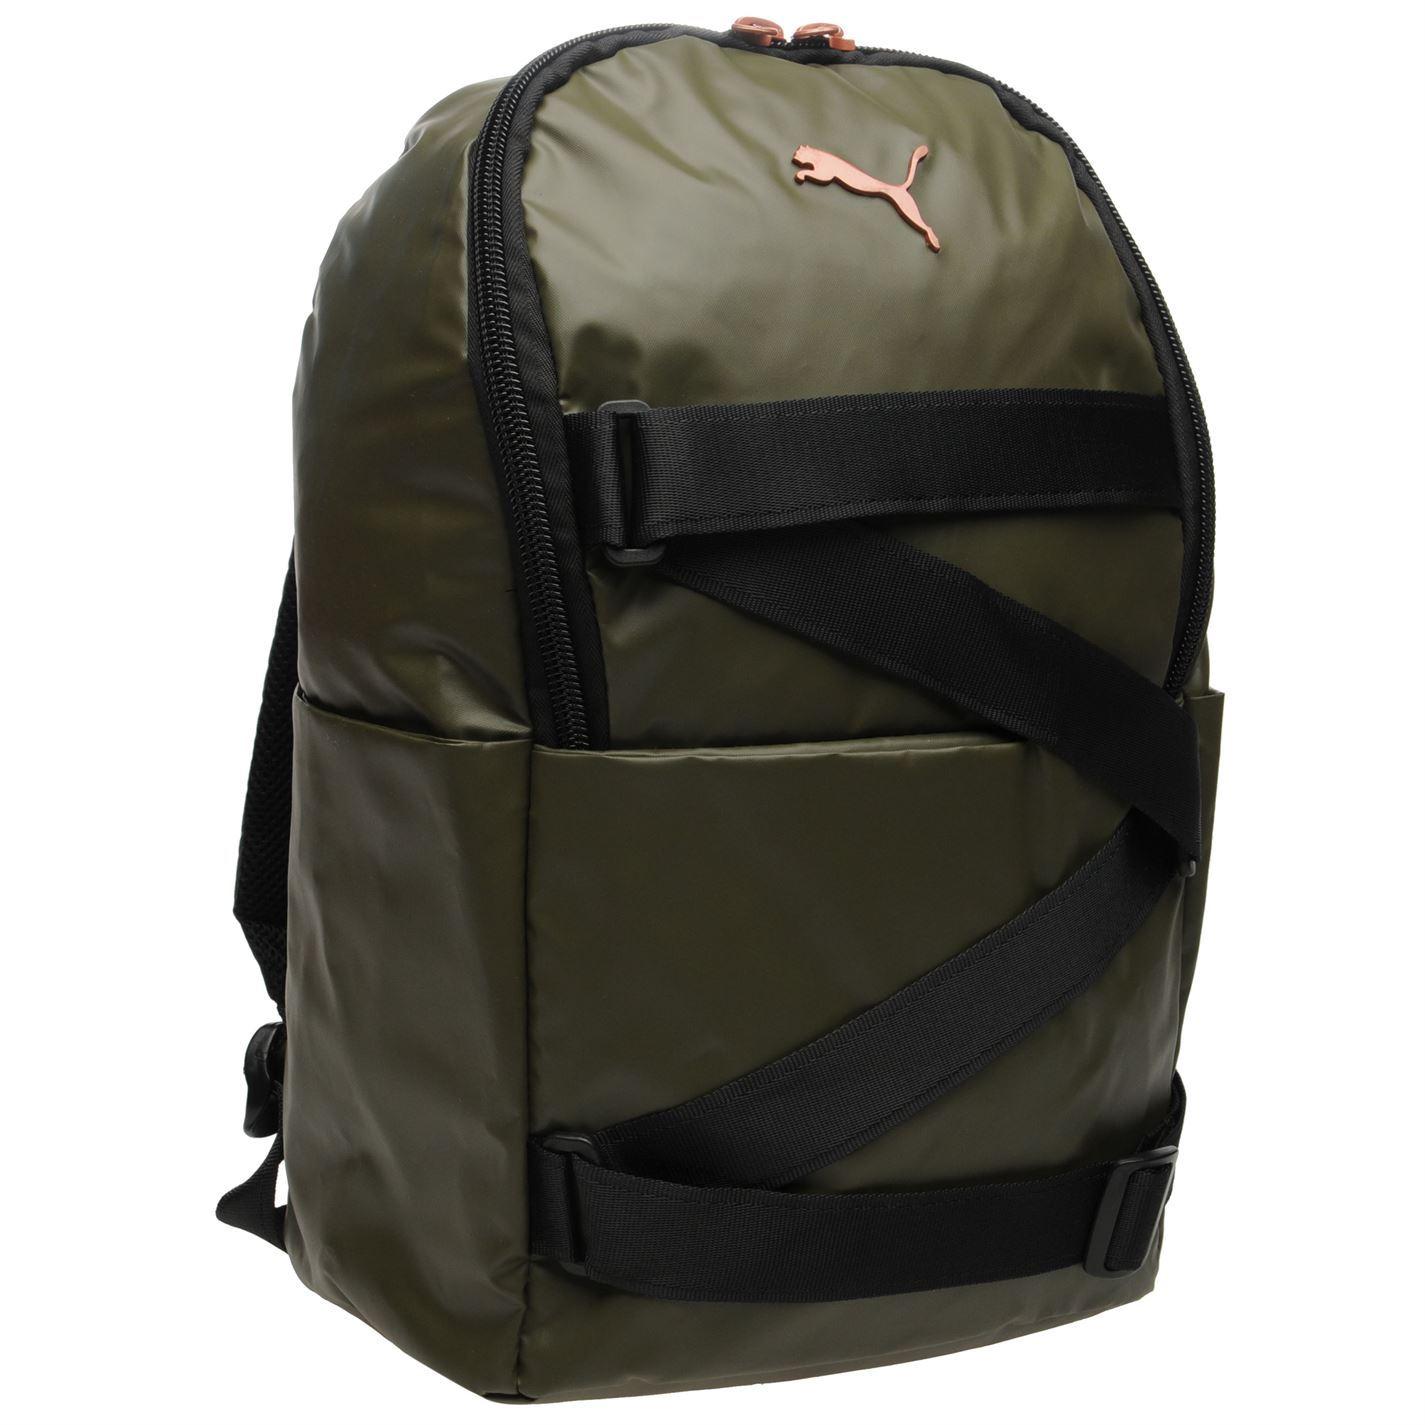 aebbf1cba5d6 ... Puma VR Barrel Bag Olive Sports Kit Holdall Carryall Gymbag ...